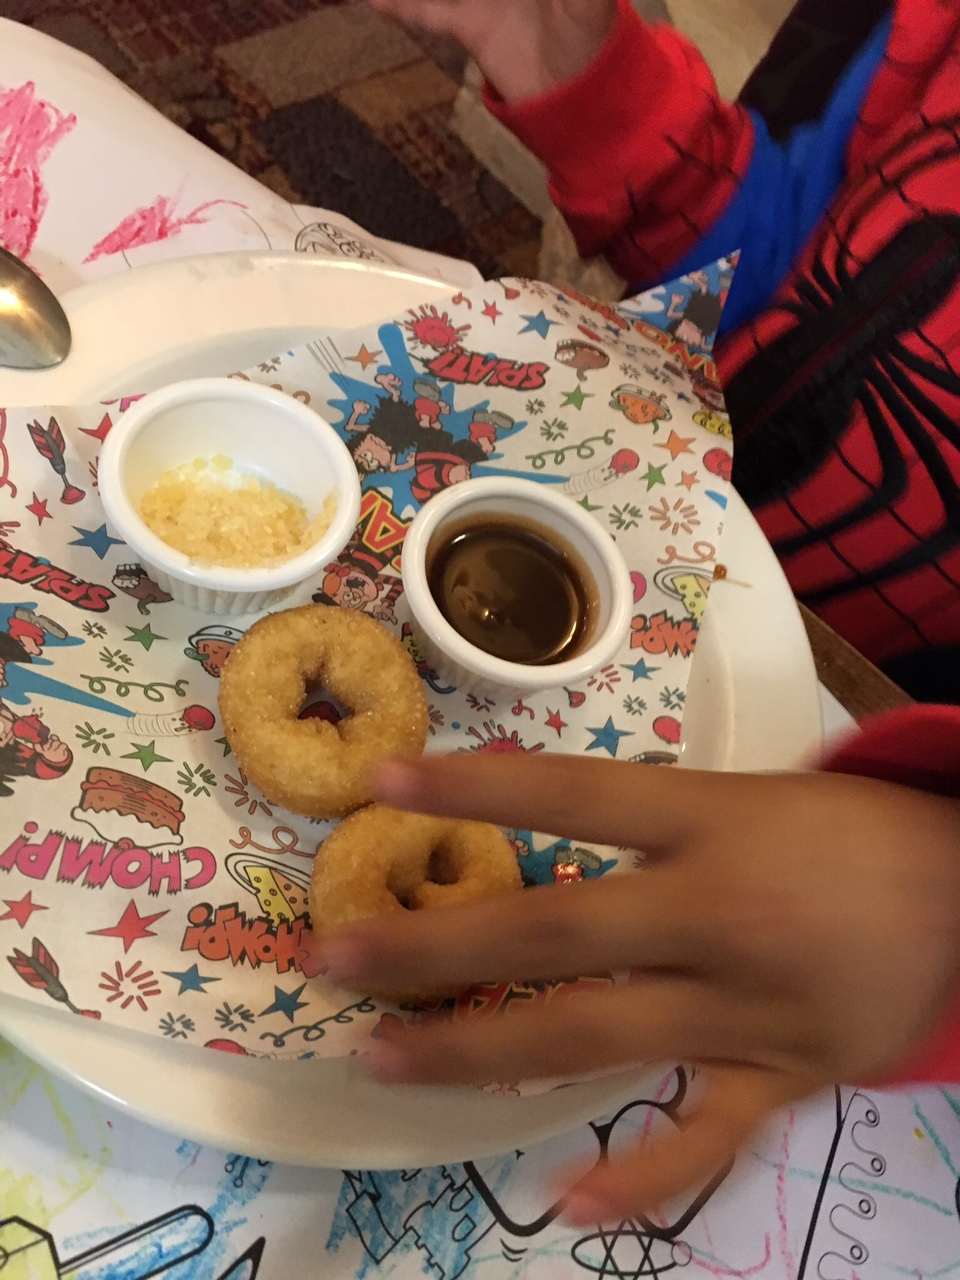 kids doughnuts at brewer's fayre